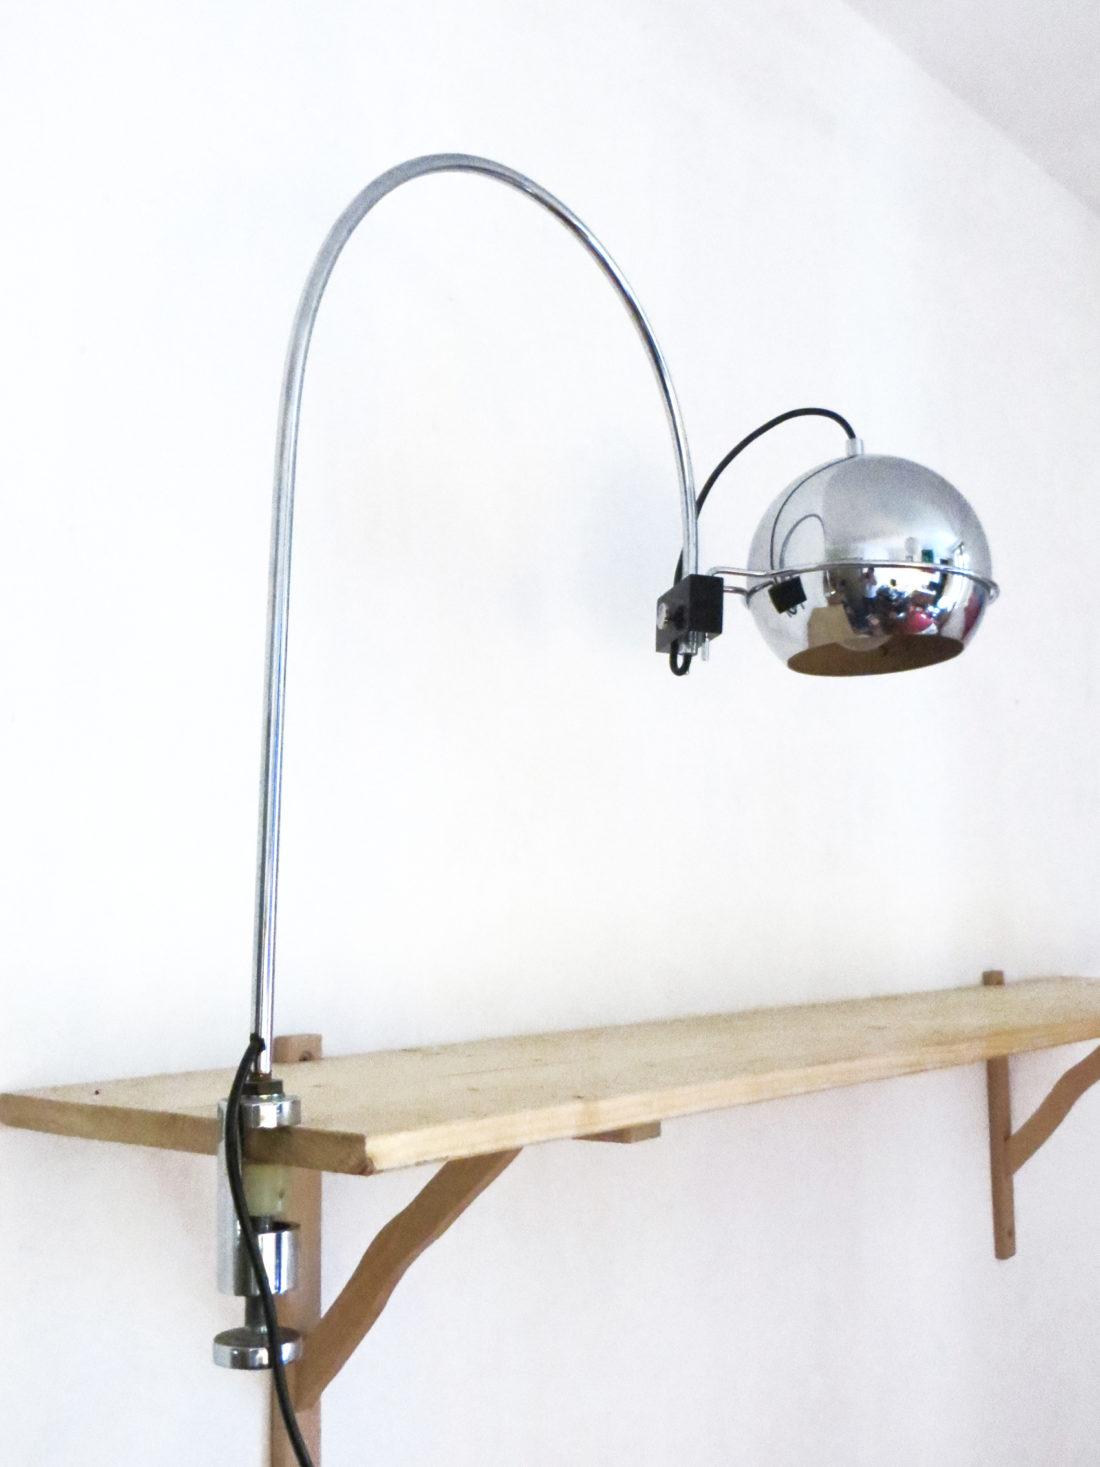 lampes d architecte best lampe style jumo with lampes d architecte free lampe articule luminor. Black Bedroom Furniture Sets. Home Design Ideas